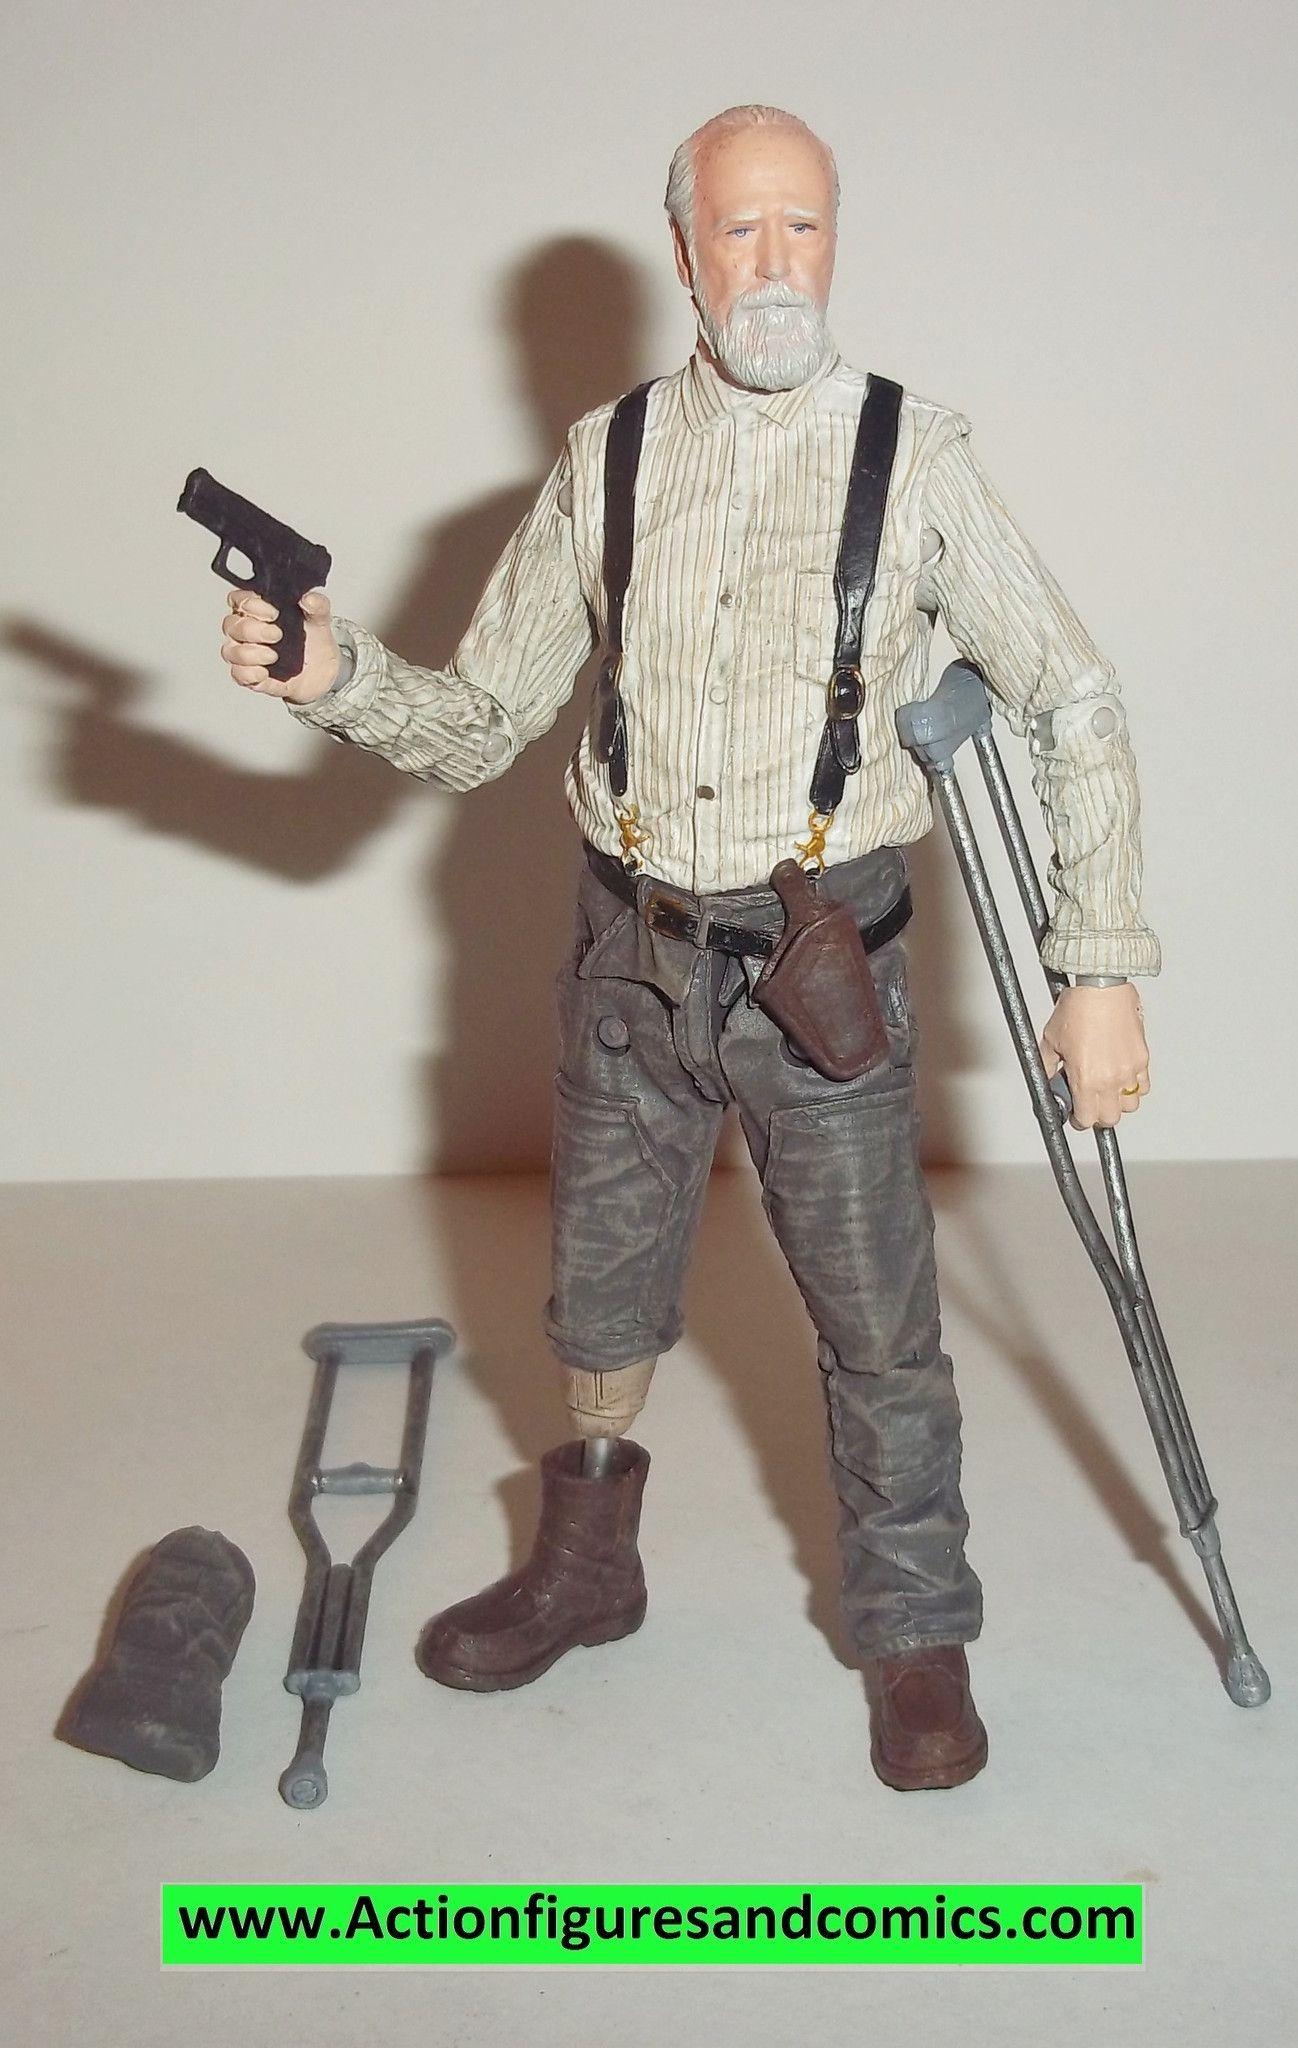 Mcfarlane walking dead series 6 daryl dixon action figure - The Walking Dead Hershel Greene Series 6 2014 Mcfarlane Toys Action Figures